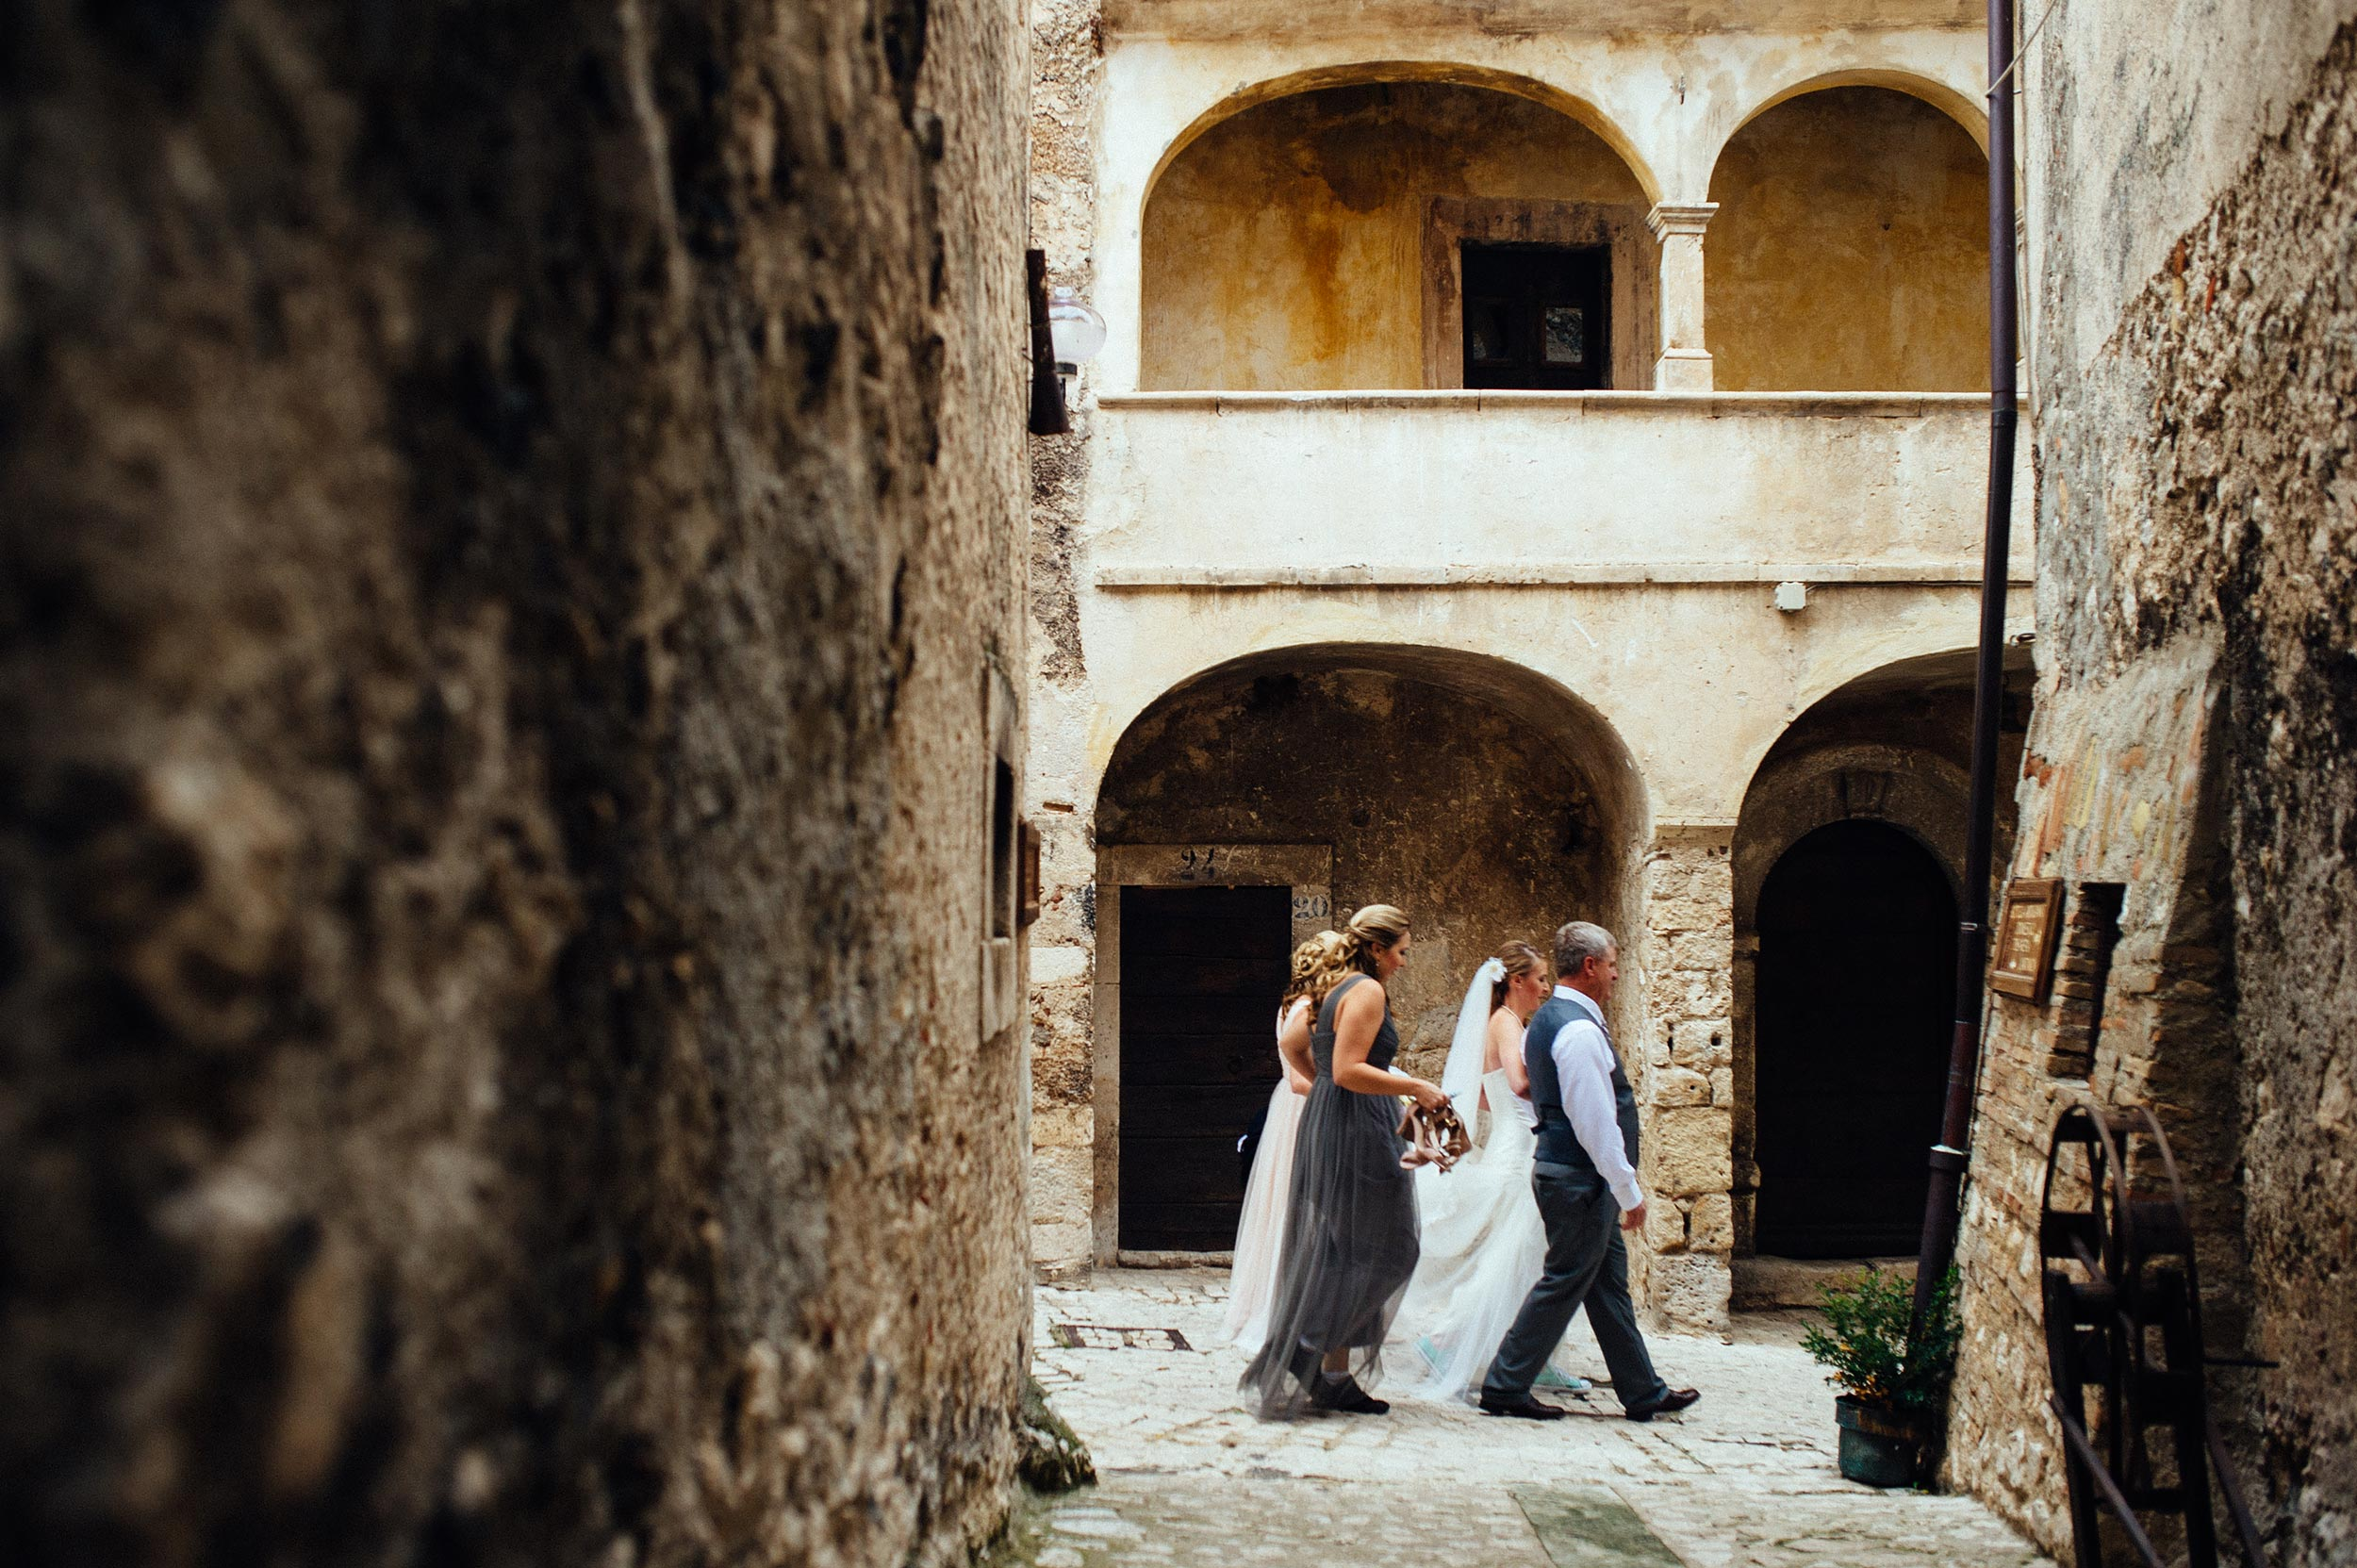 2014-Shelby-Jocelyn-Santo-Stefano-Di-Sessanio-Wedding-Photographer-Italy-Alessandro-Avenali-26.jpg